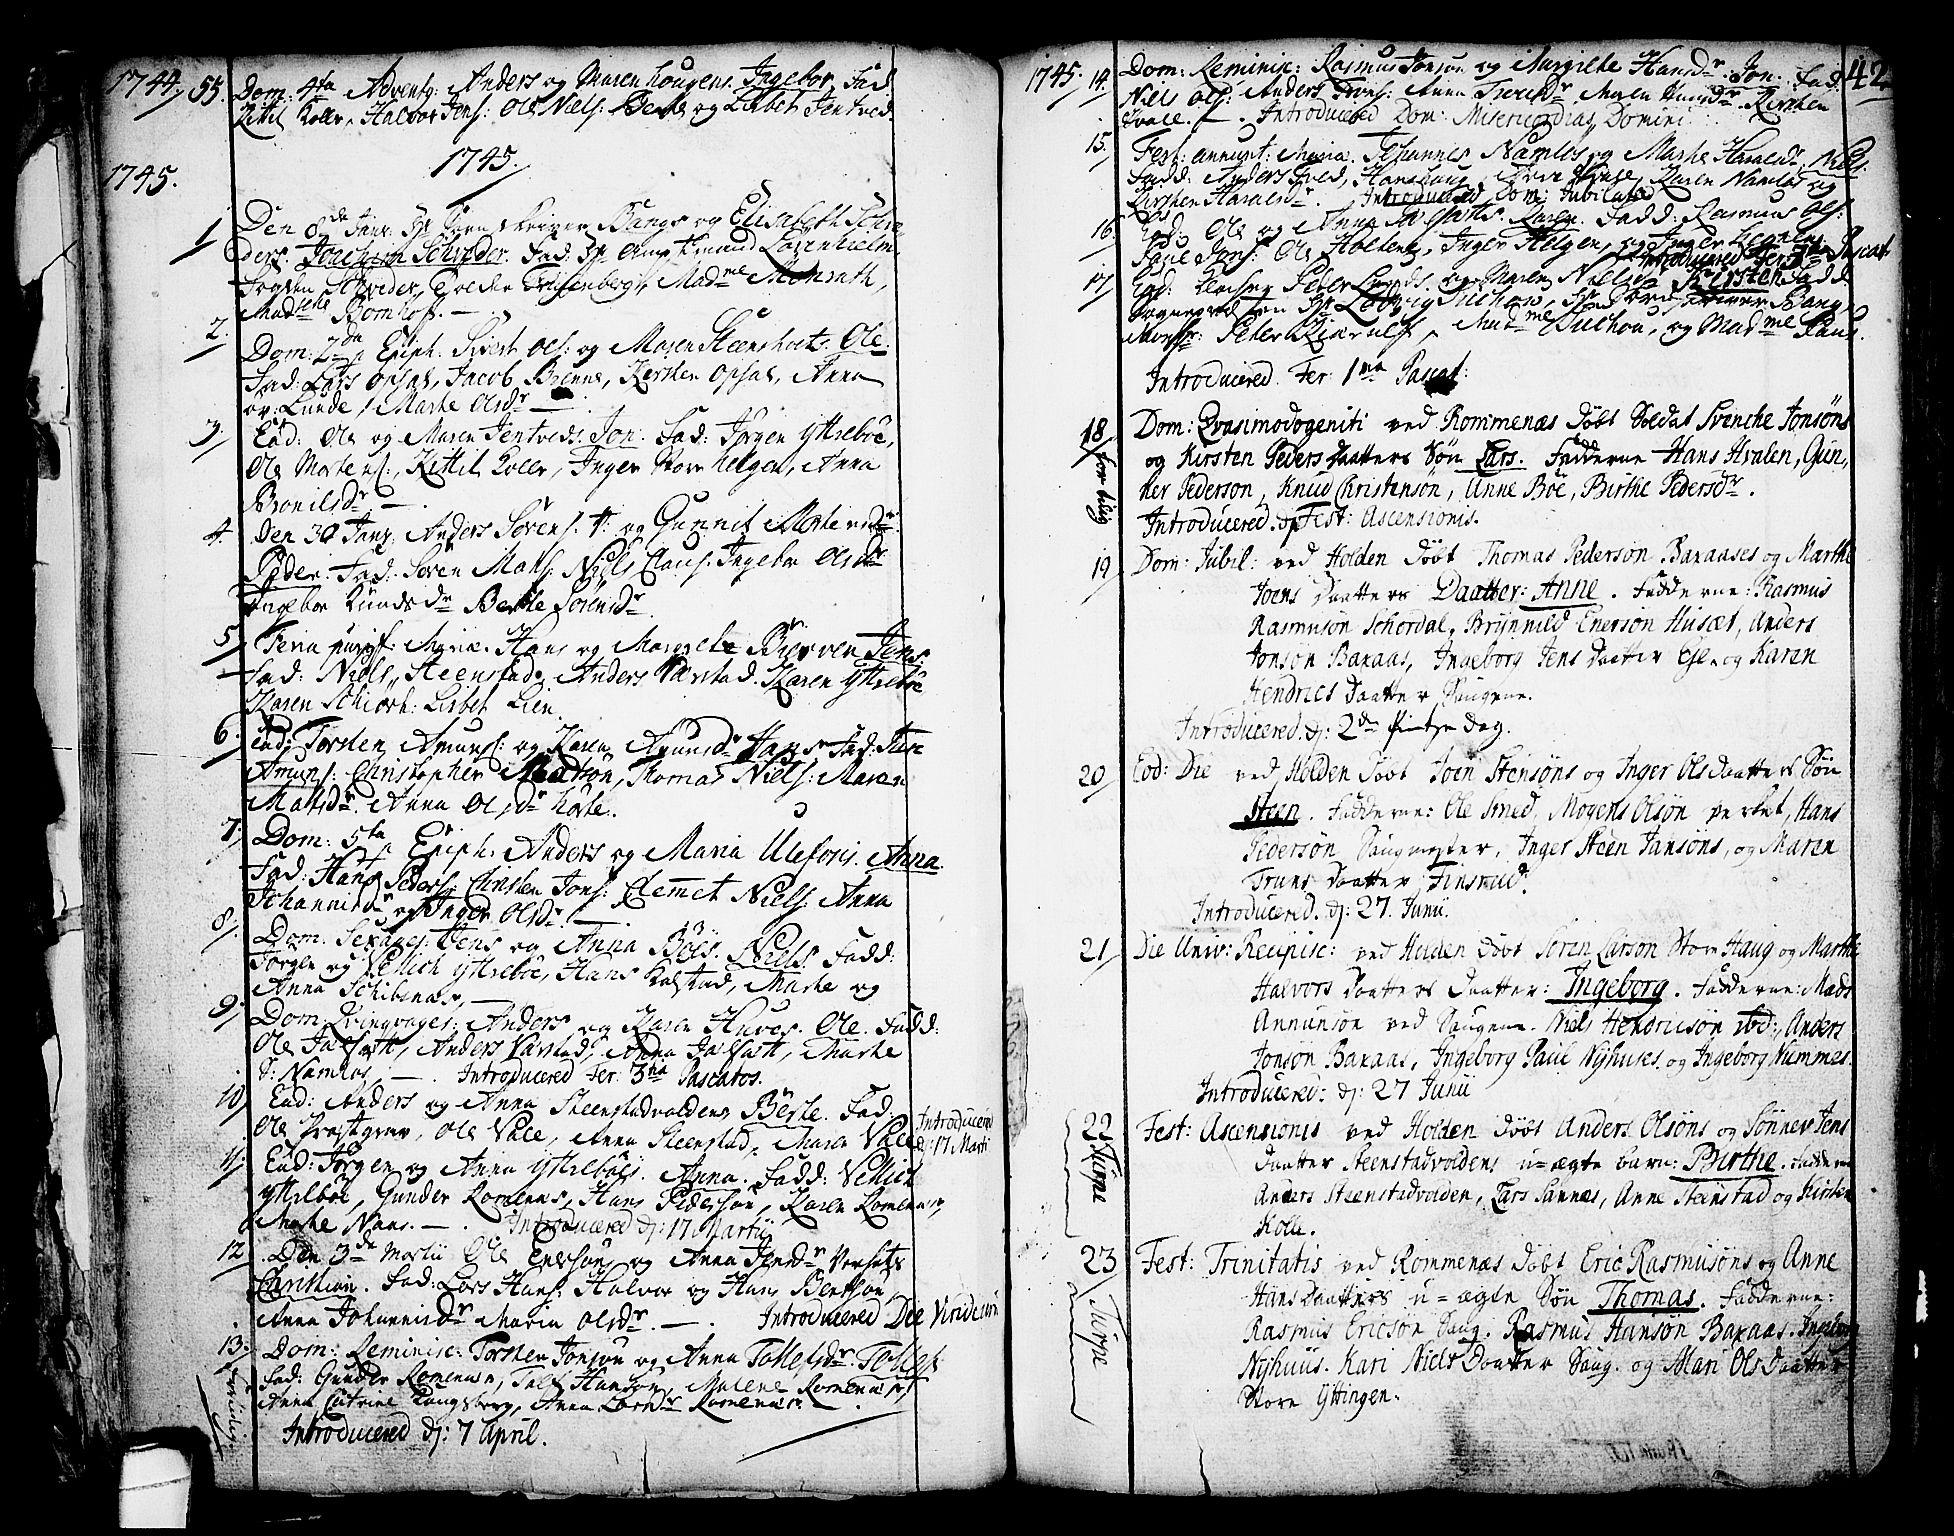 SAKO, Holla kirkebøker, F/Fa/L0001: Ministerialbok nr. 1, 1717-1779, s. 42